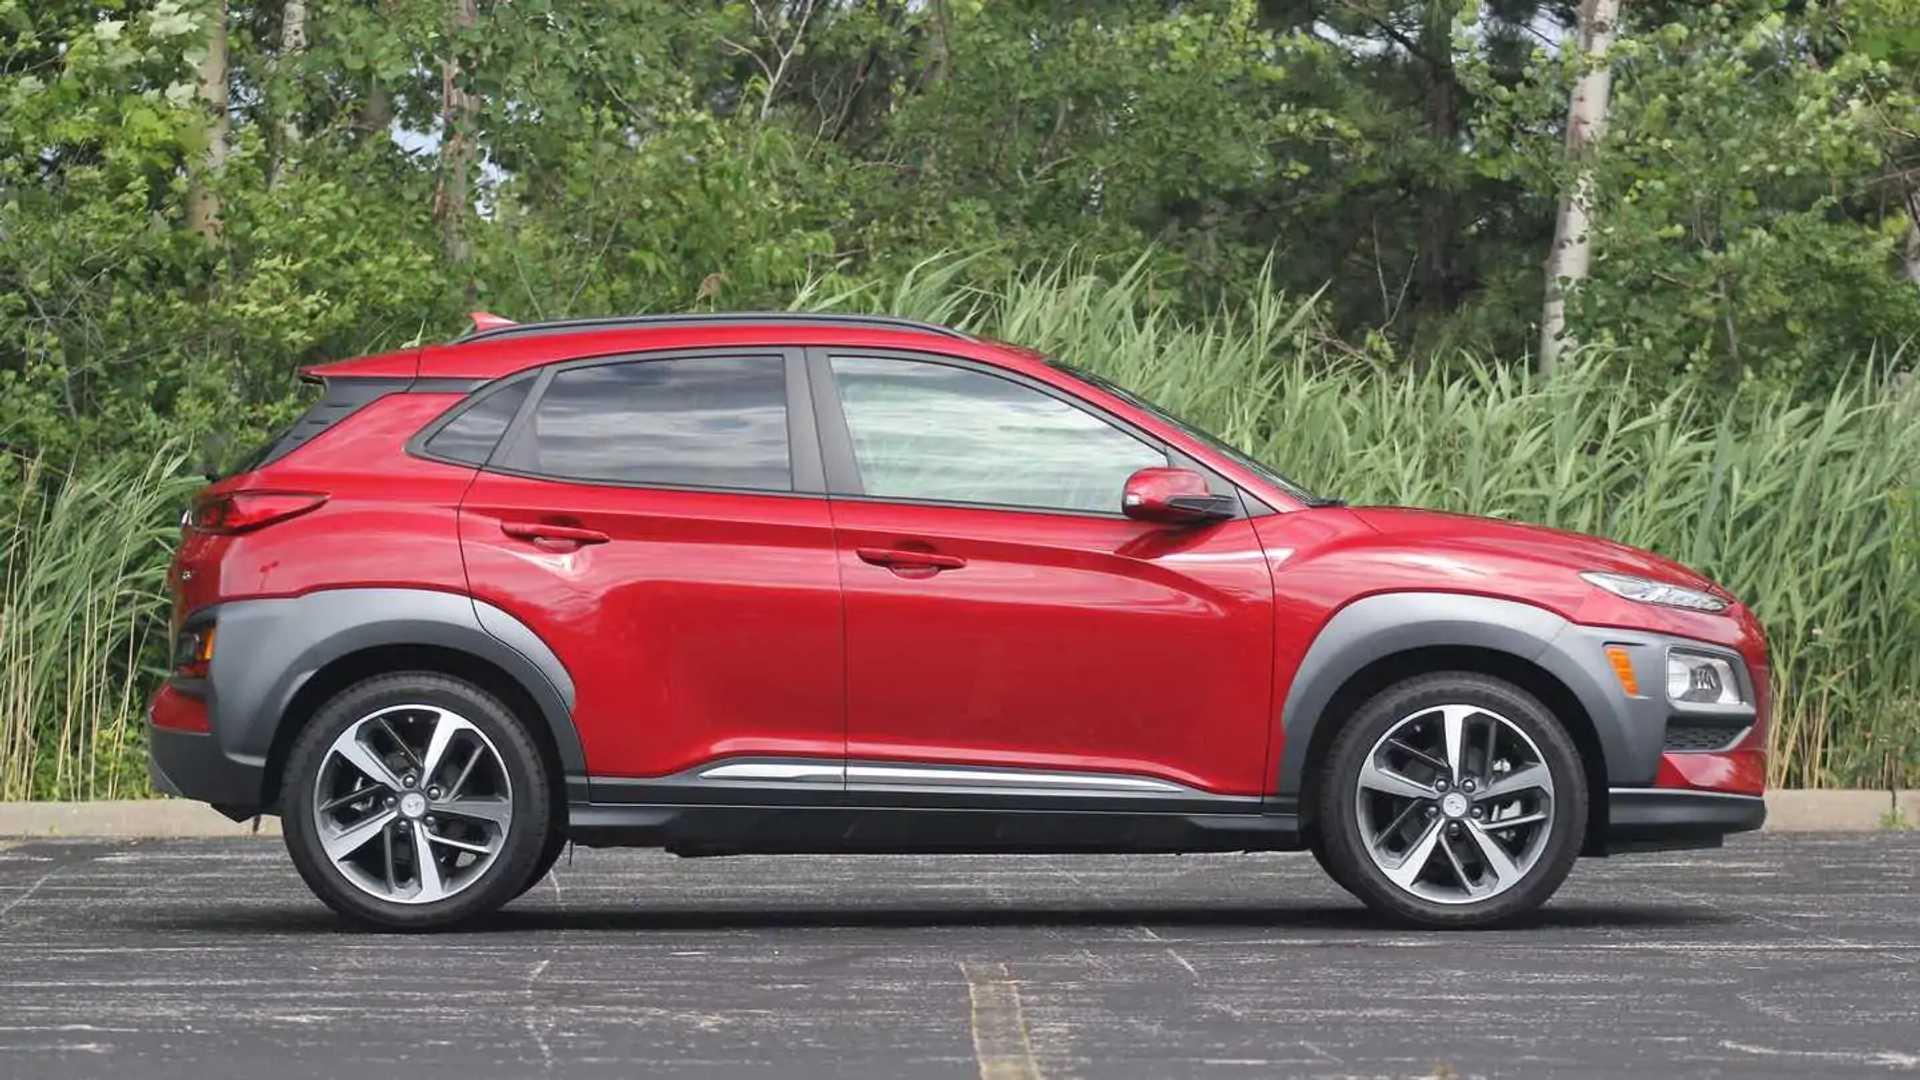 2019 Hyundai Kona Ultimate Review: Short And Stout